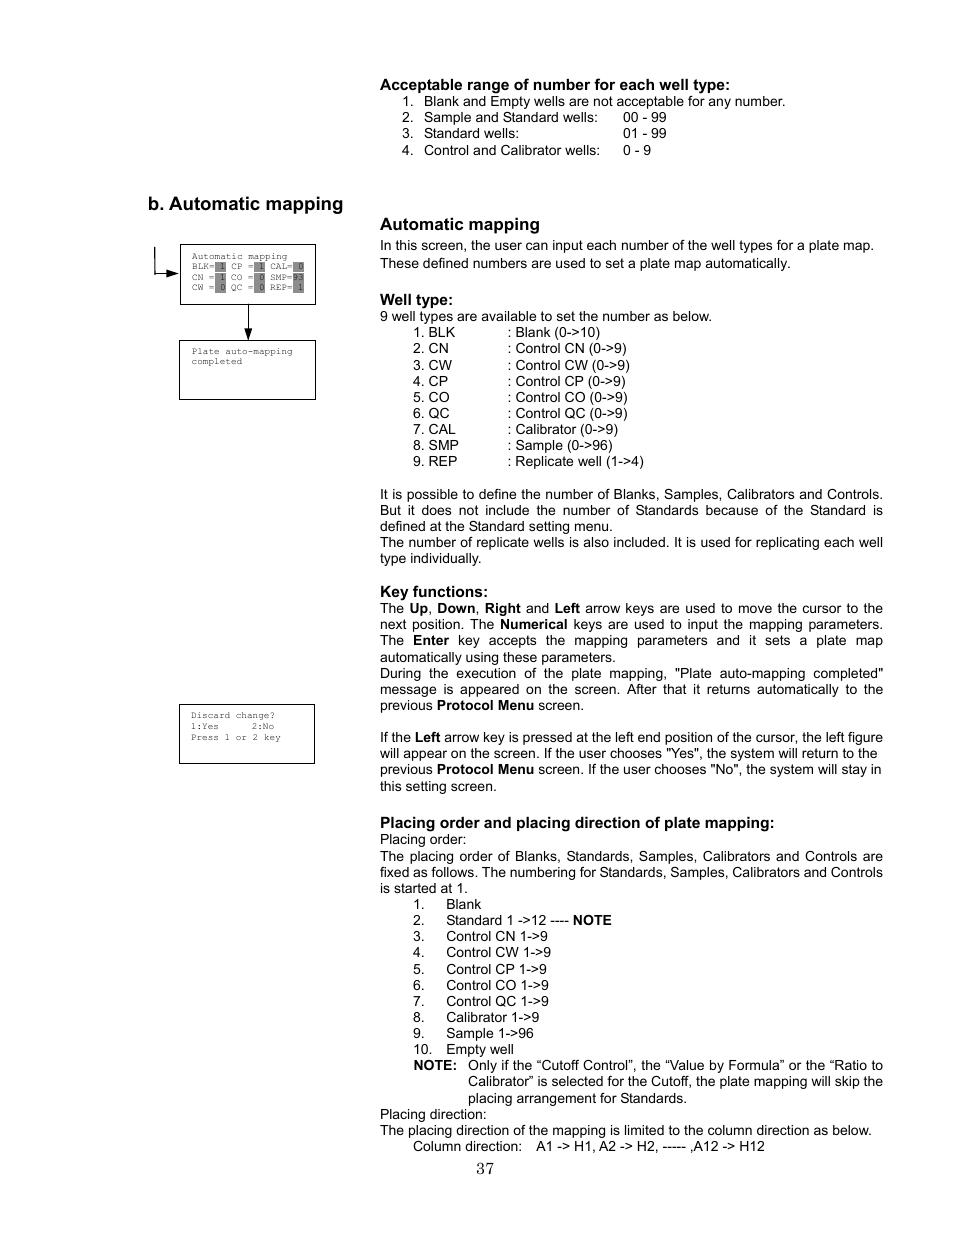 b automatic mapping bio rad model 680 microplate reader rh manualsdir com Operators Manual Instruction Manual Example